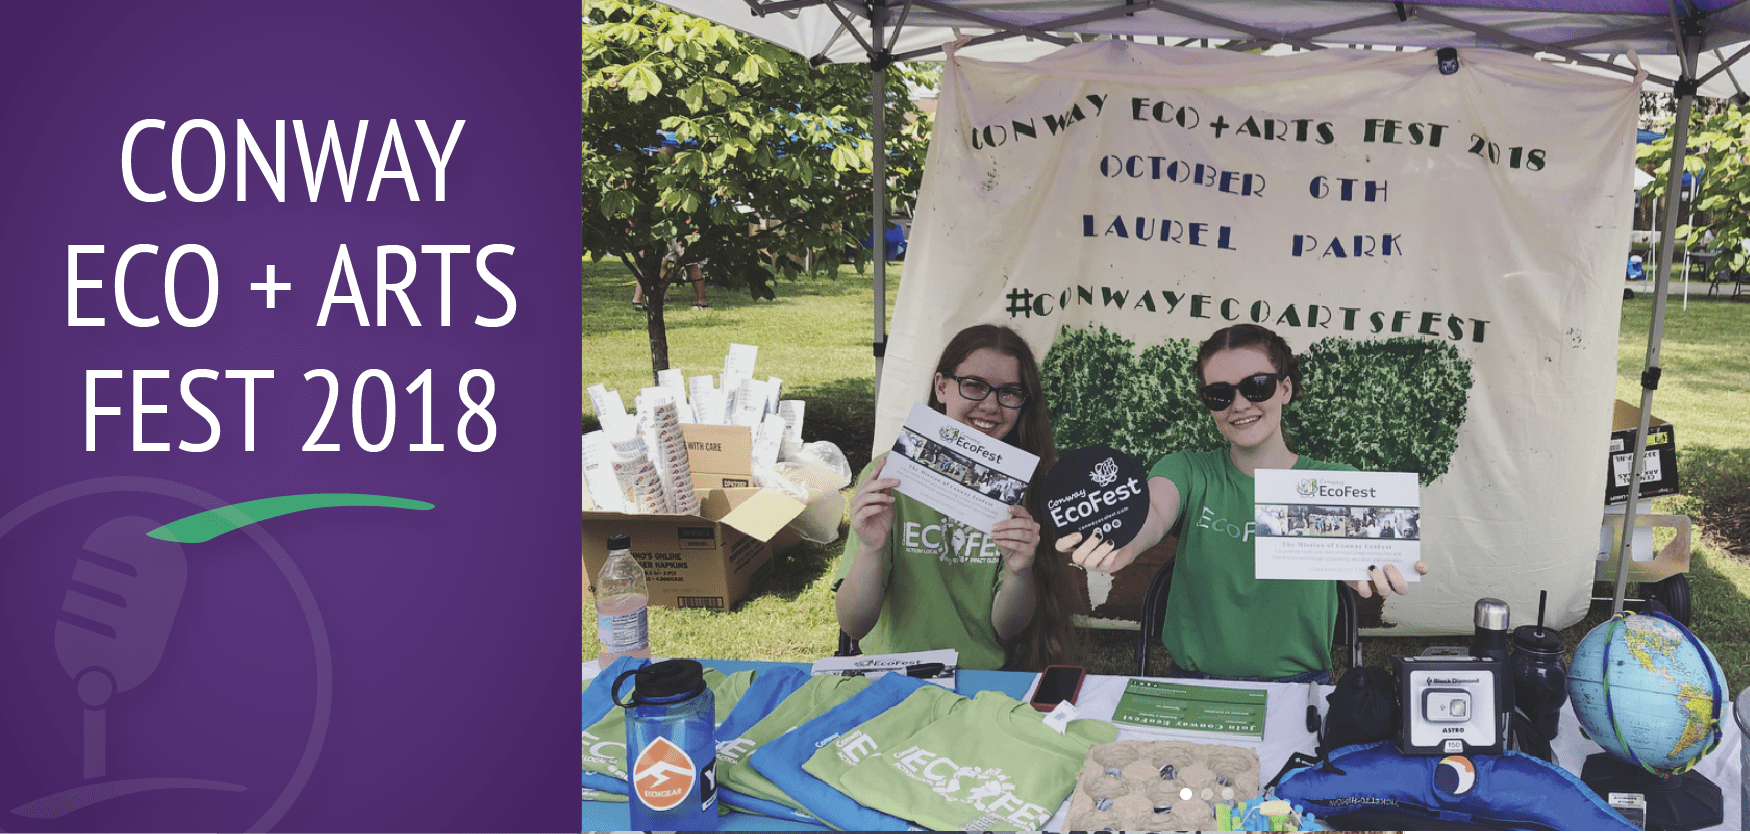 Conway Eco + Arts Fest 2018